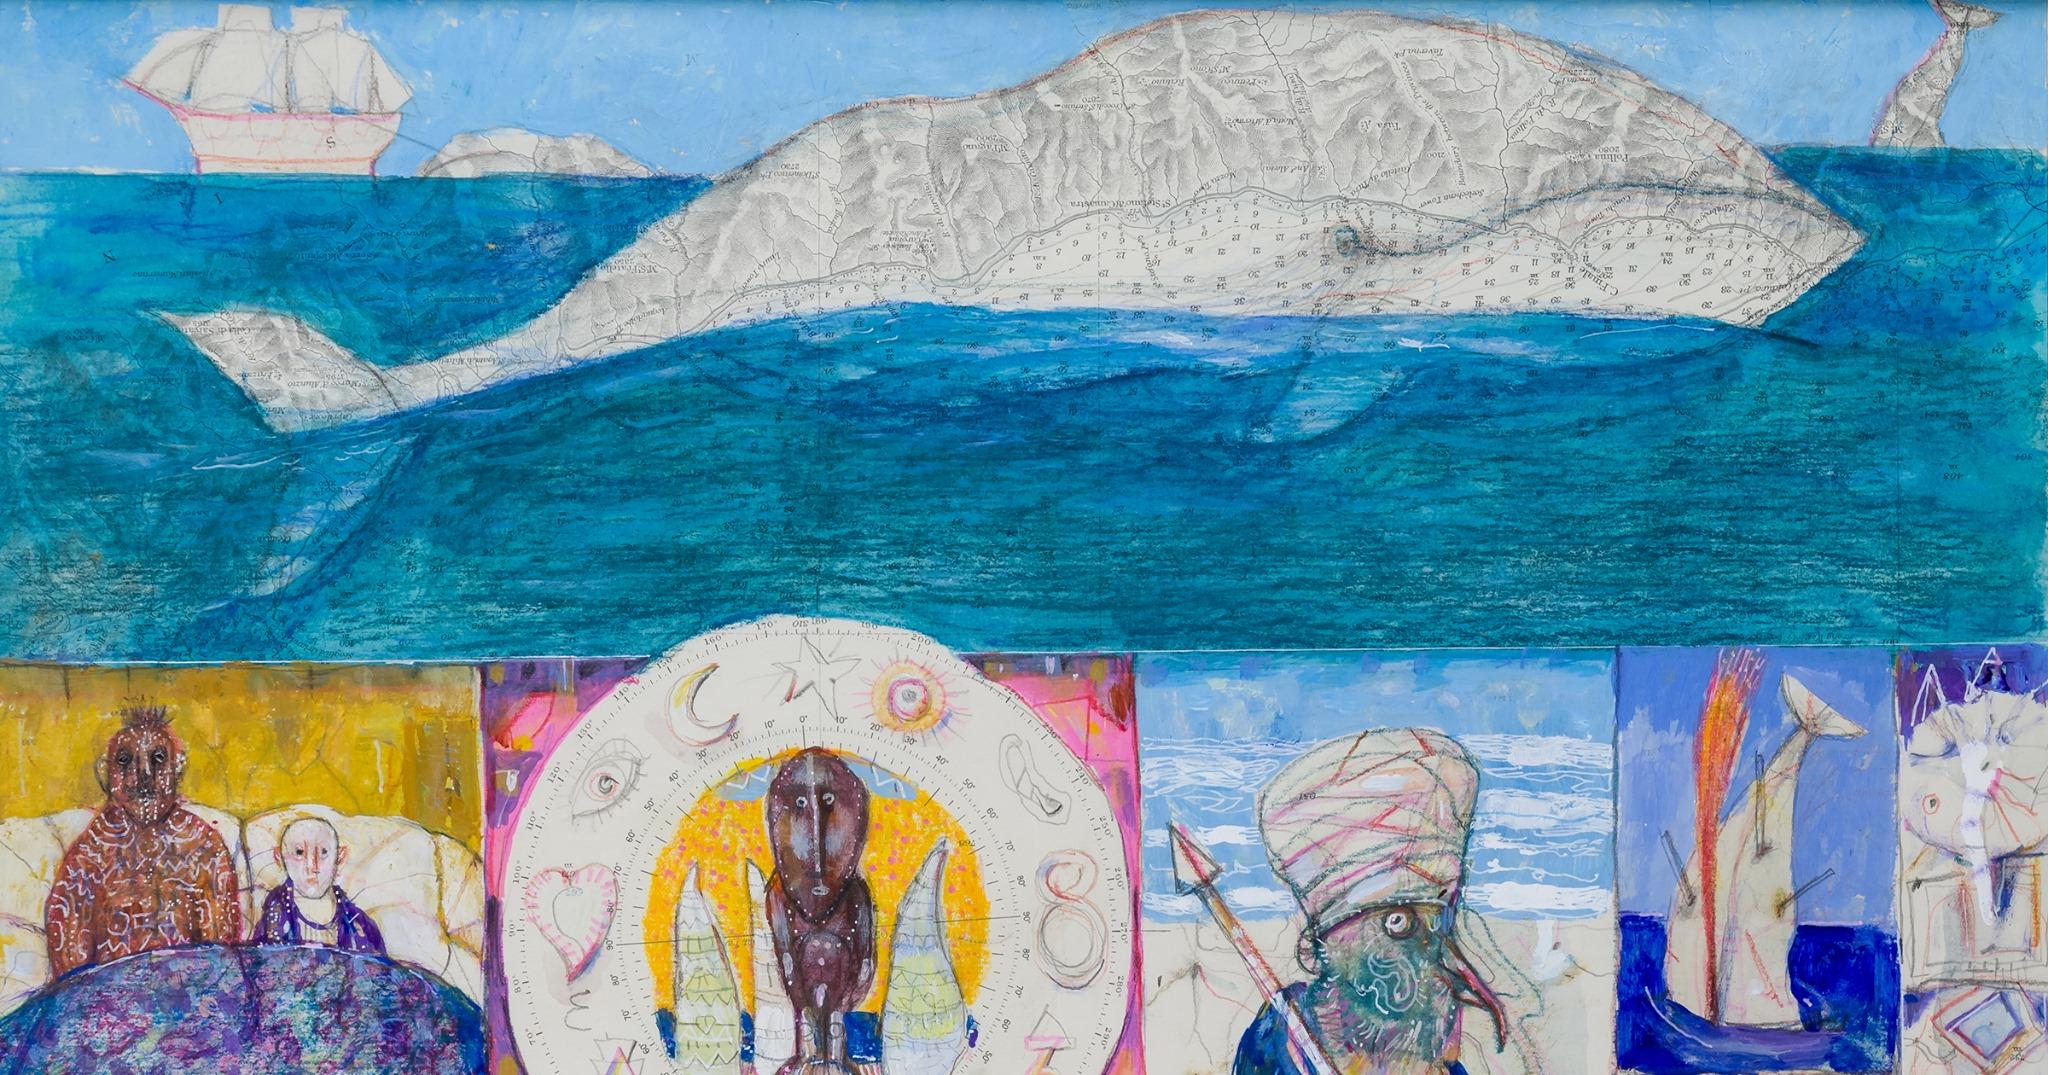 Proiezione di documentari d'arte al MuSA - Ciclo